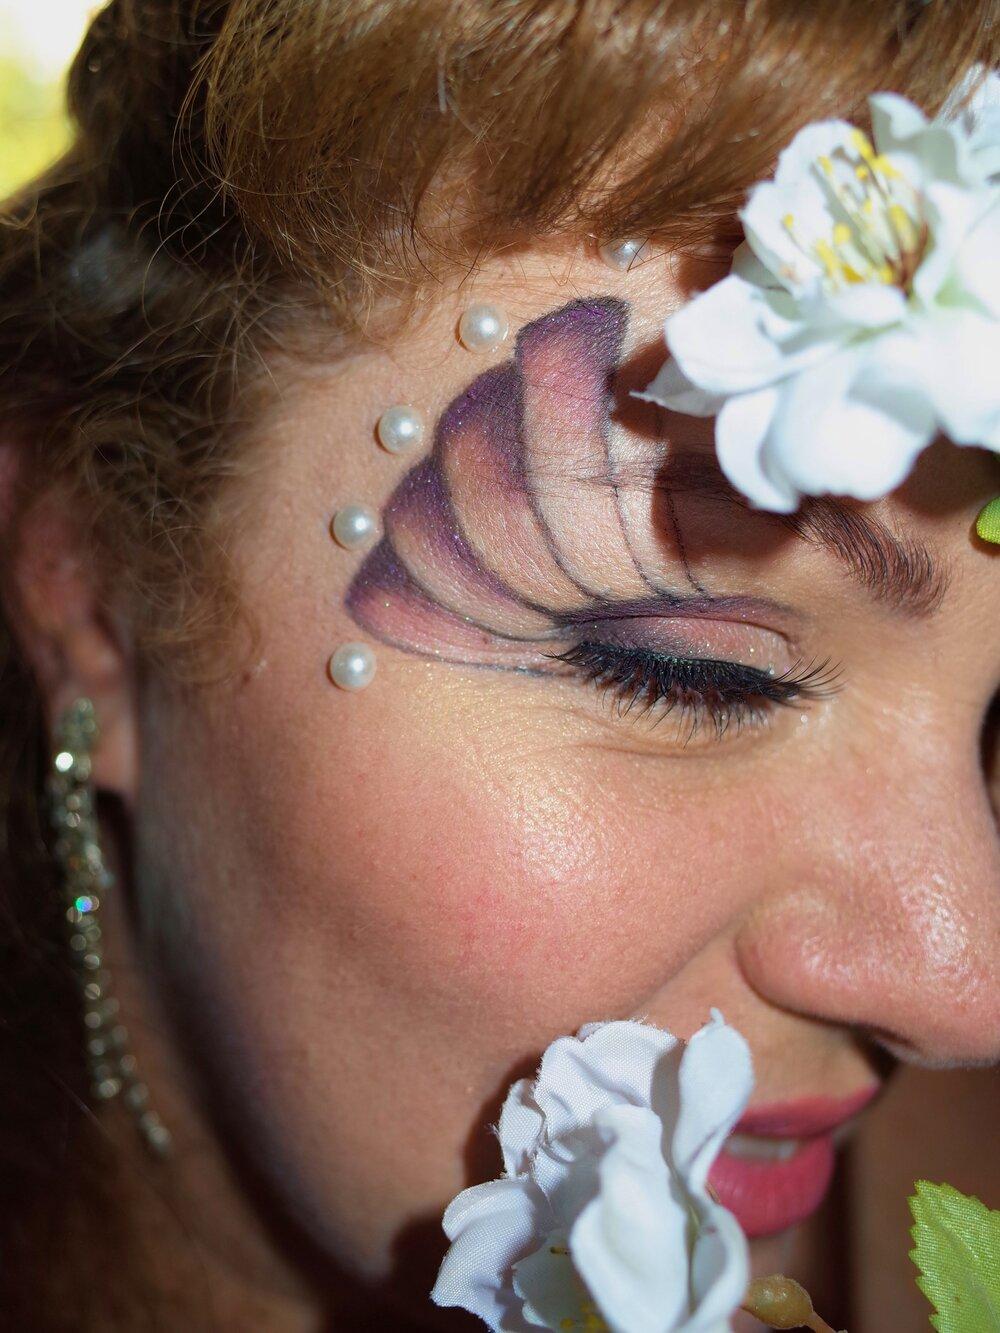 Strange World of Ukraine Beauty Salons для Dazed Beauty, 2018